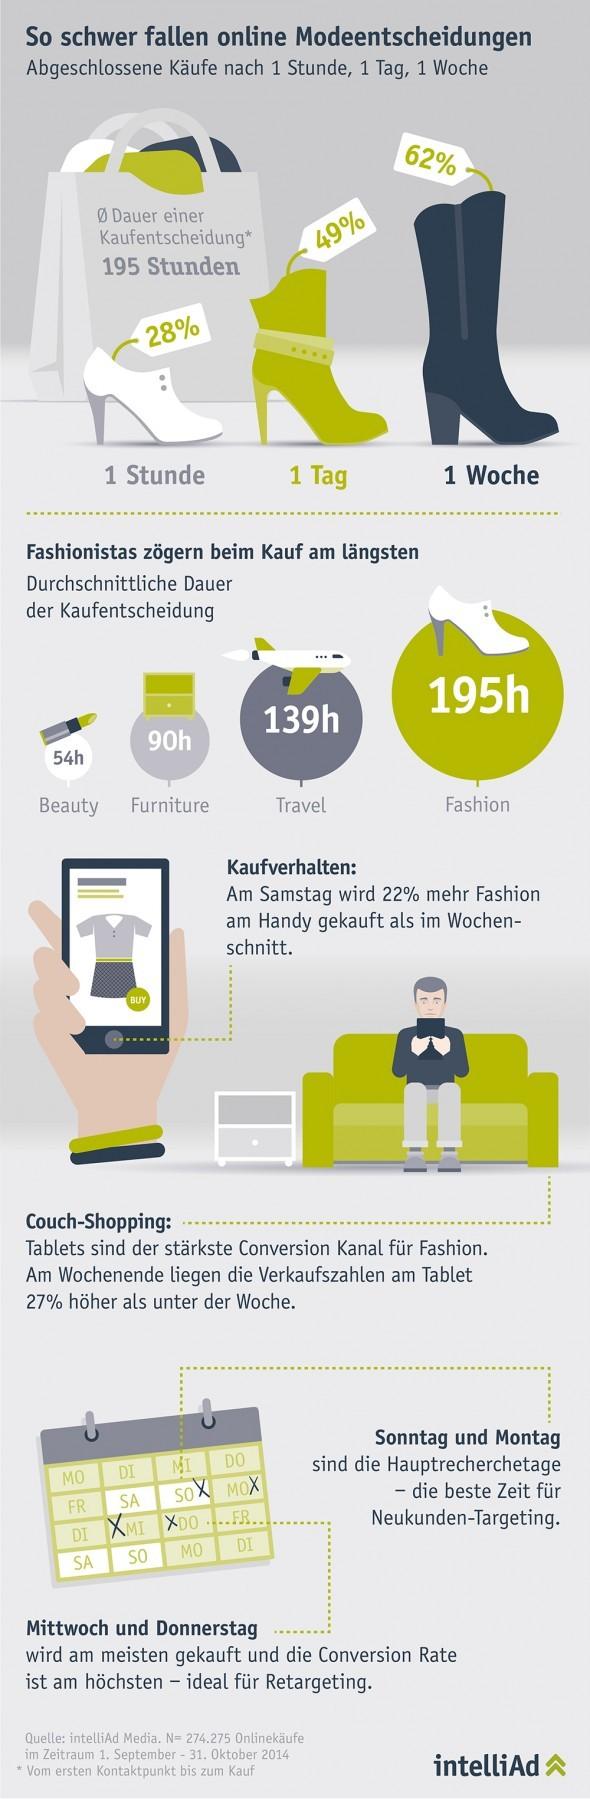 intelliAd Infografik Fahion_1